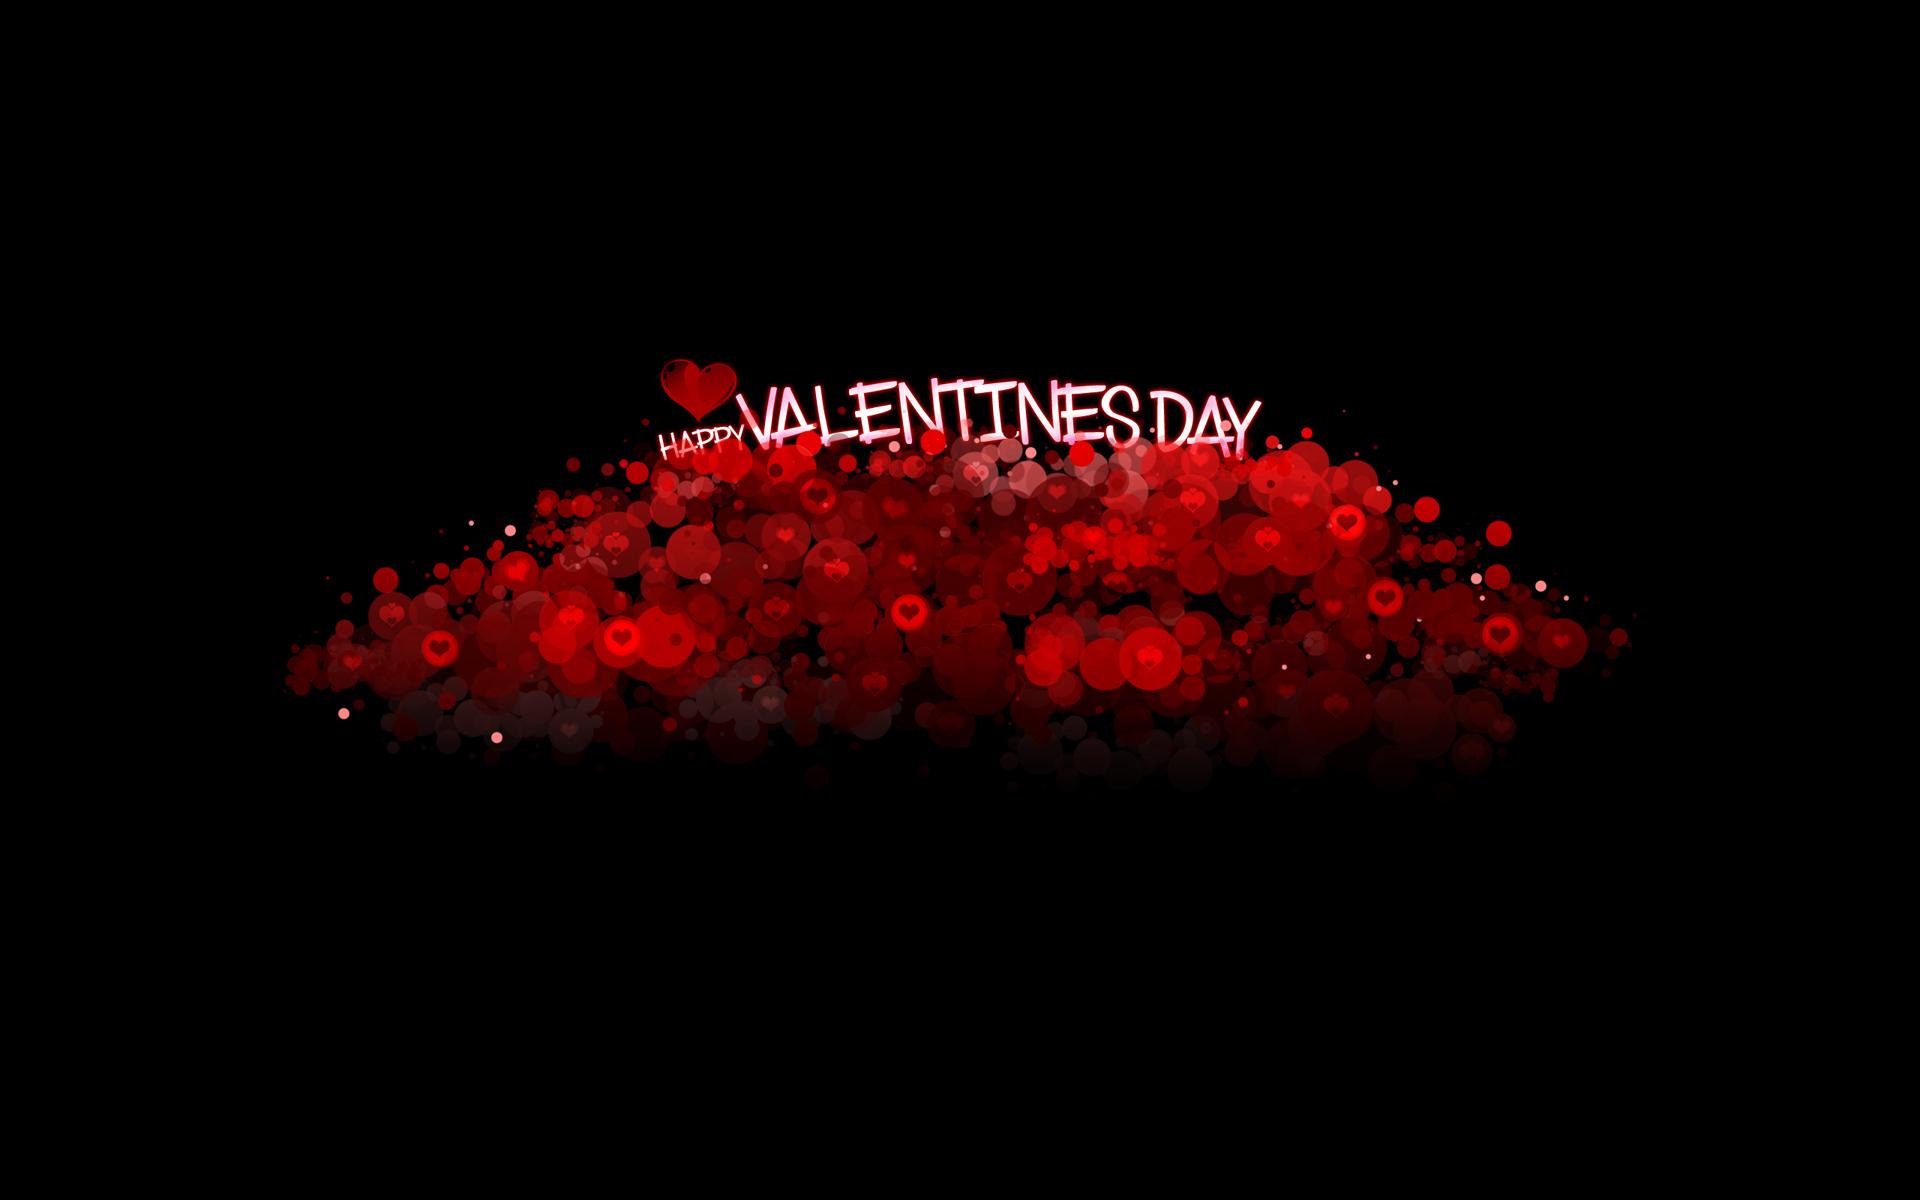 valentines day wallpaper 5243